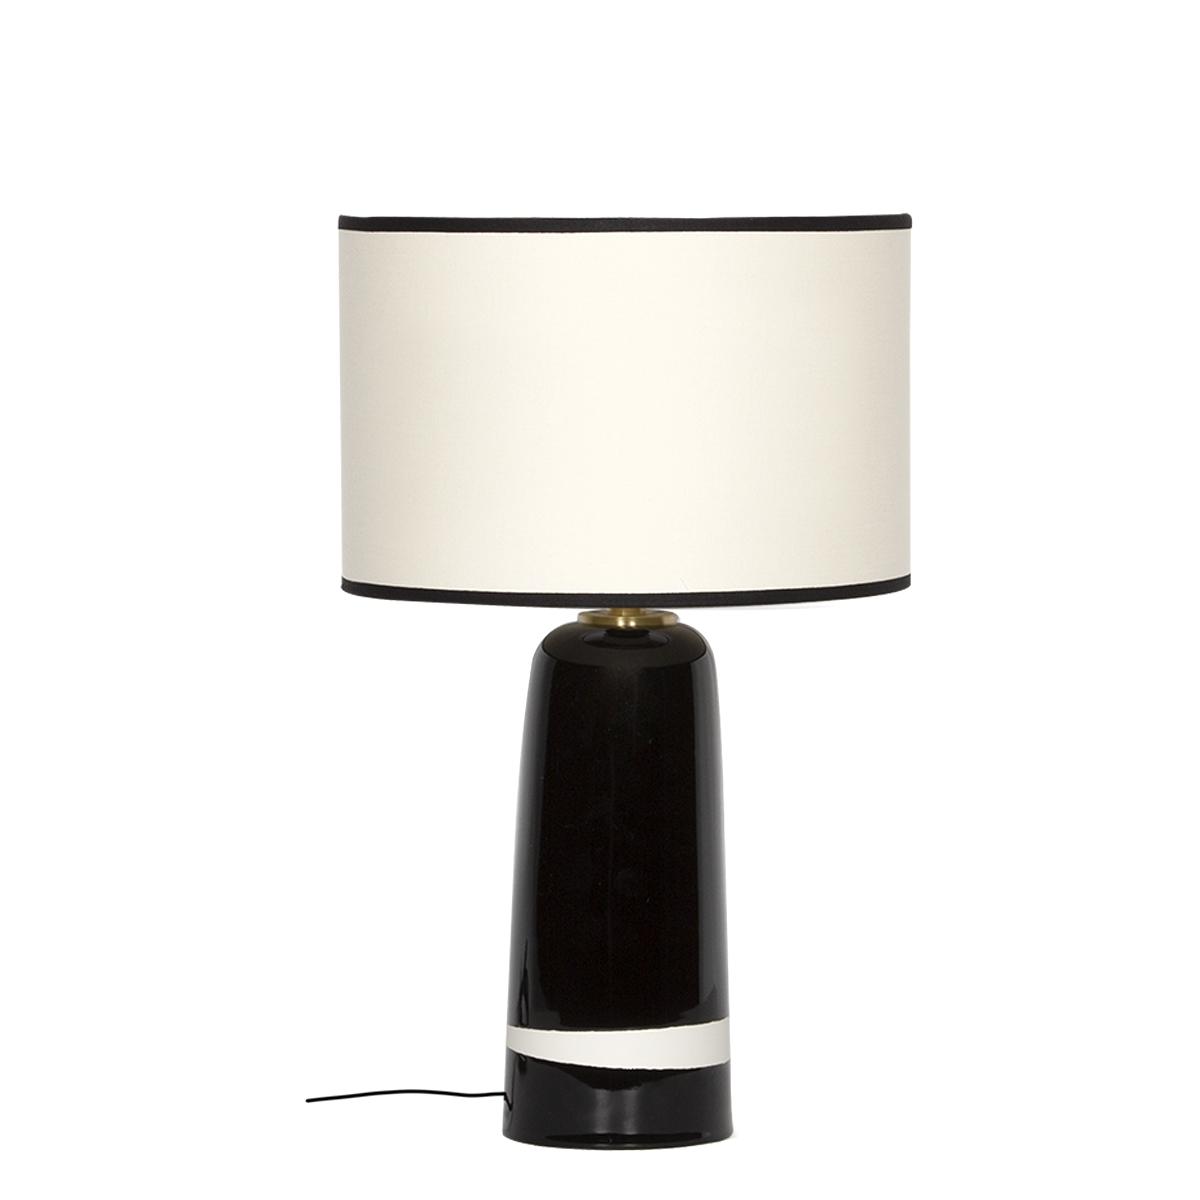 Petite lampe a poser design